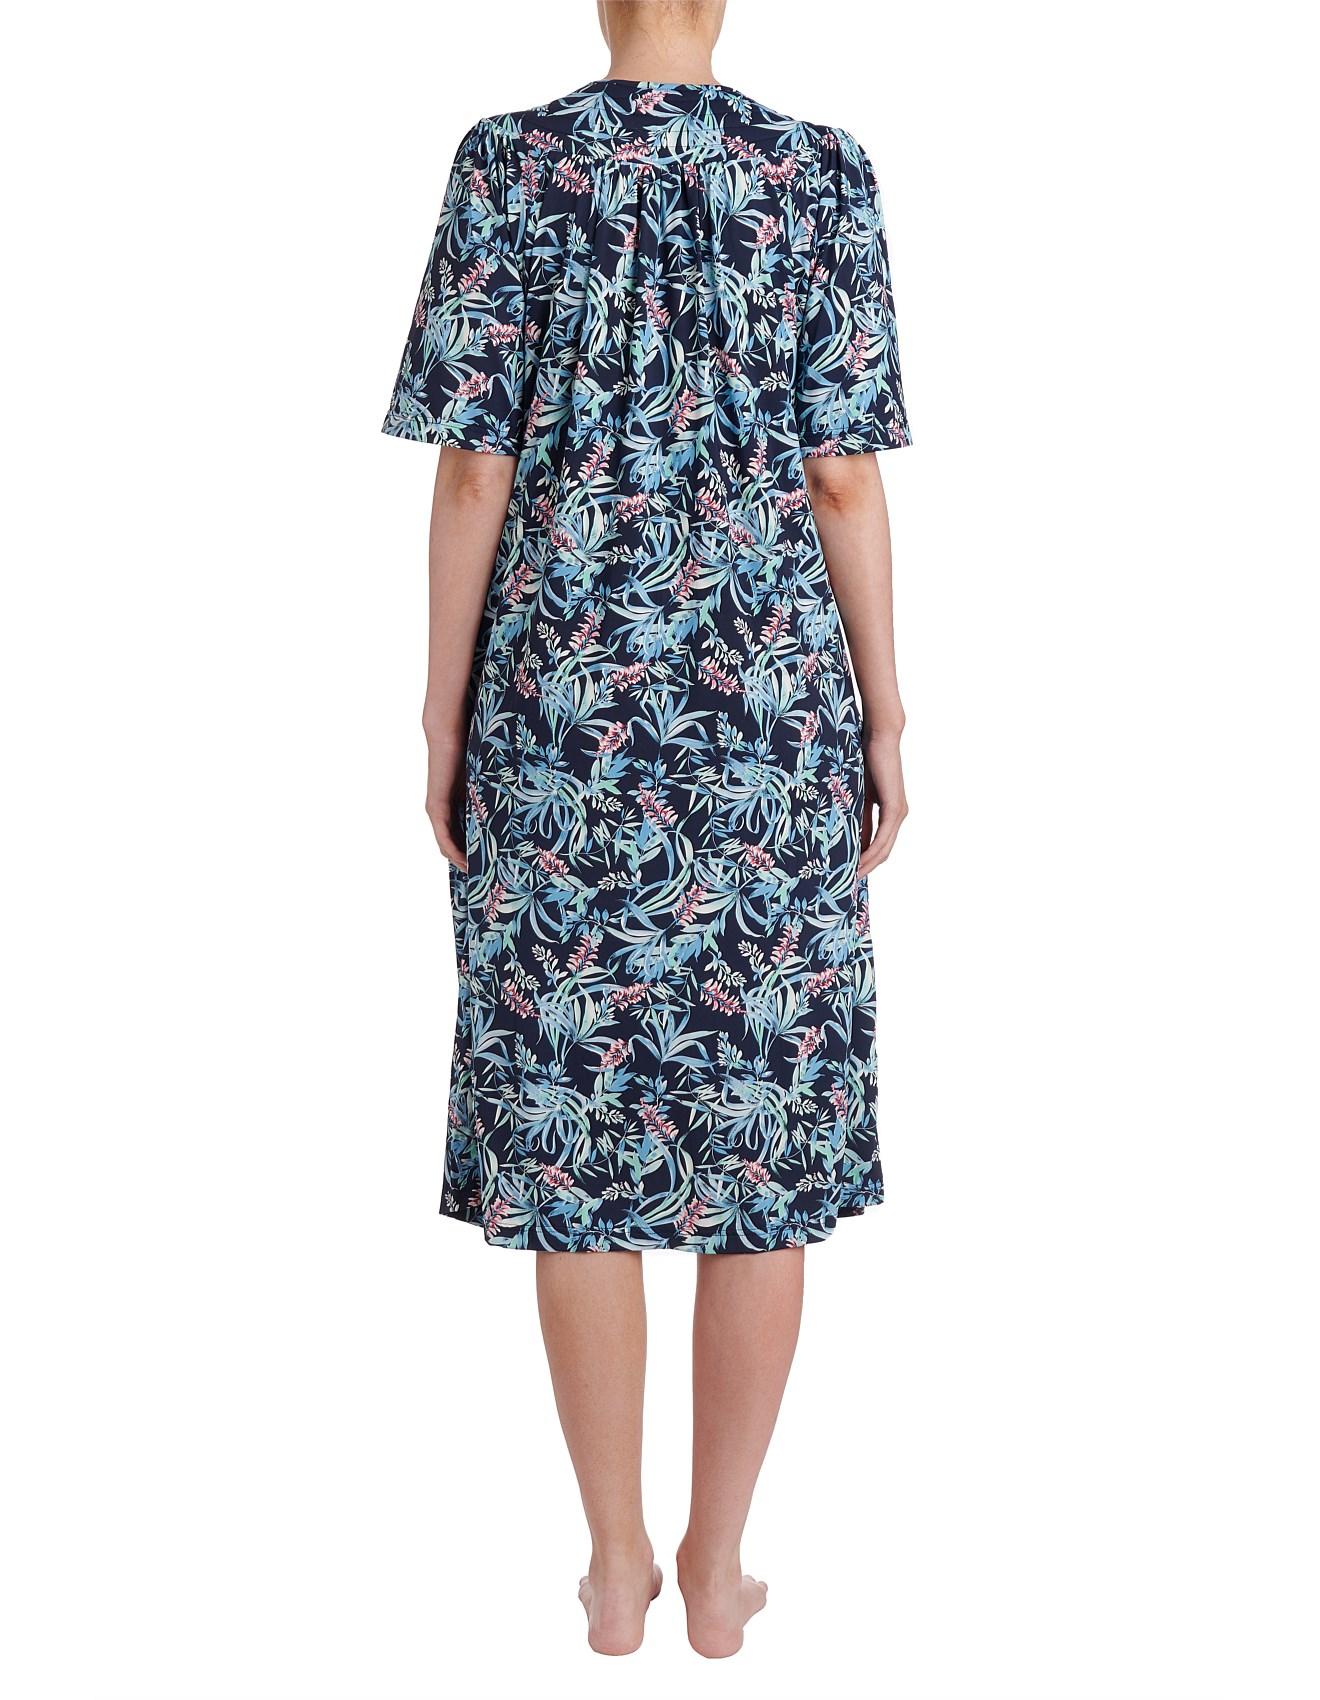 Dressing Gowns & Robes   Short & Long Dressing Gowns   David Jones ...